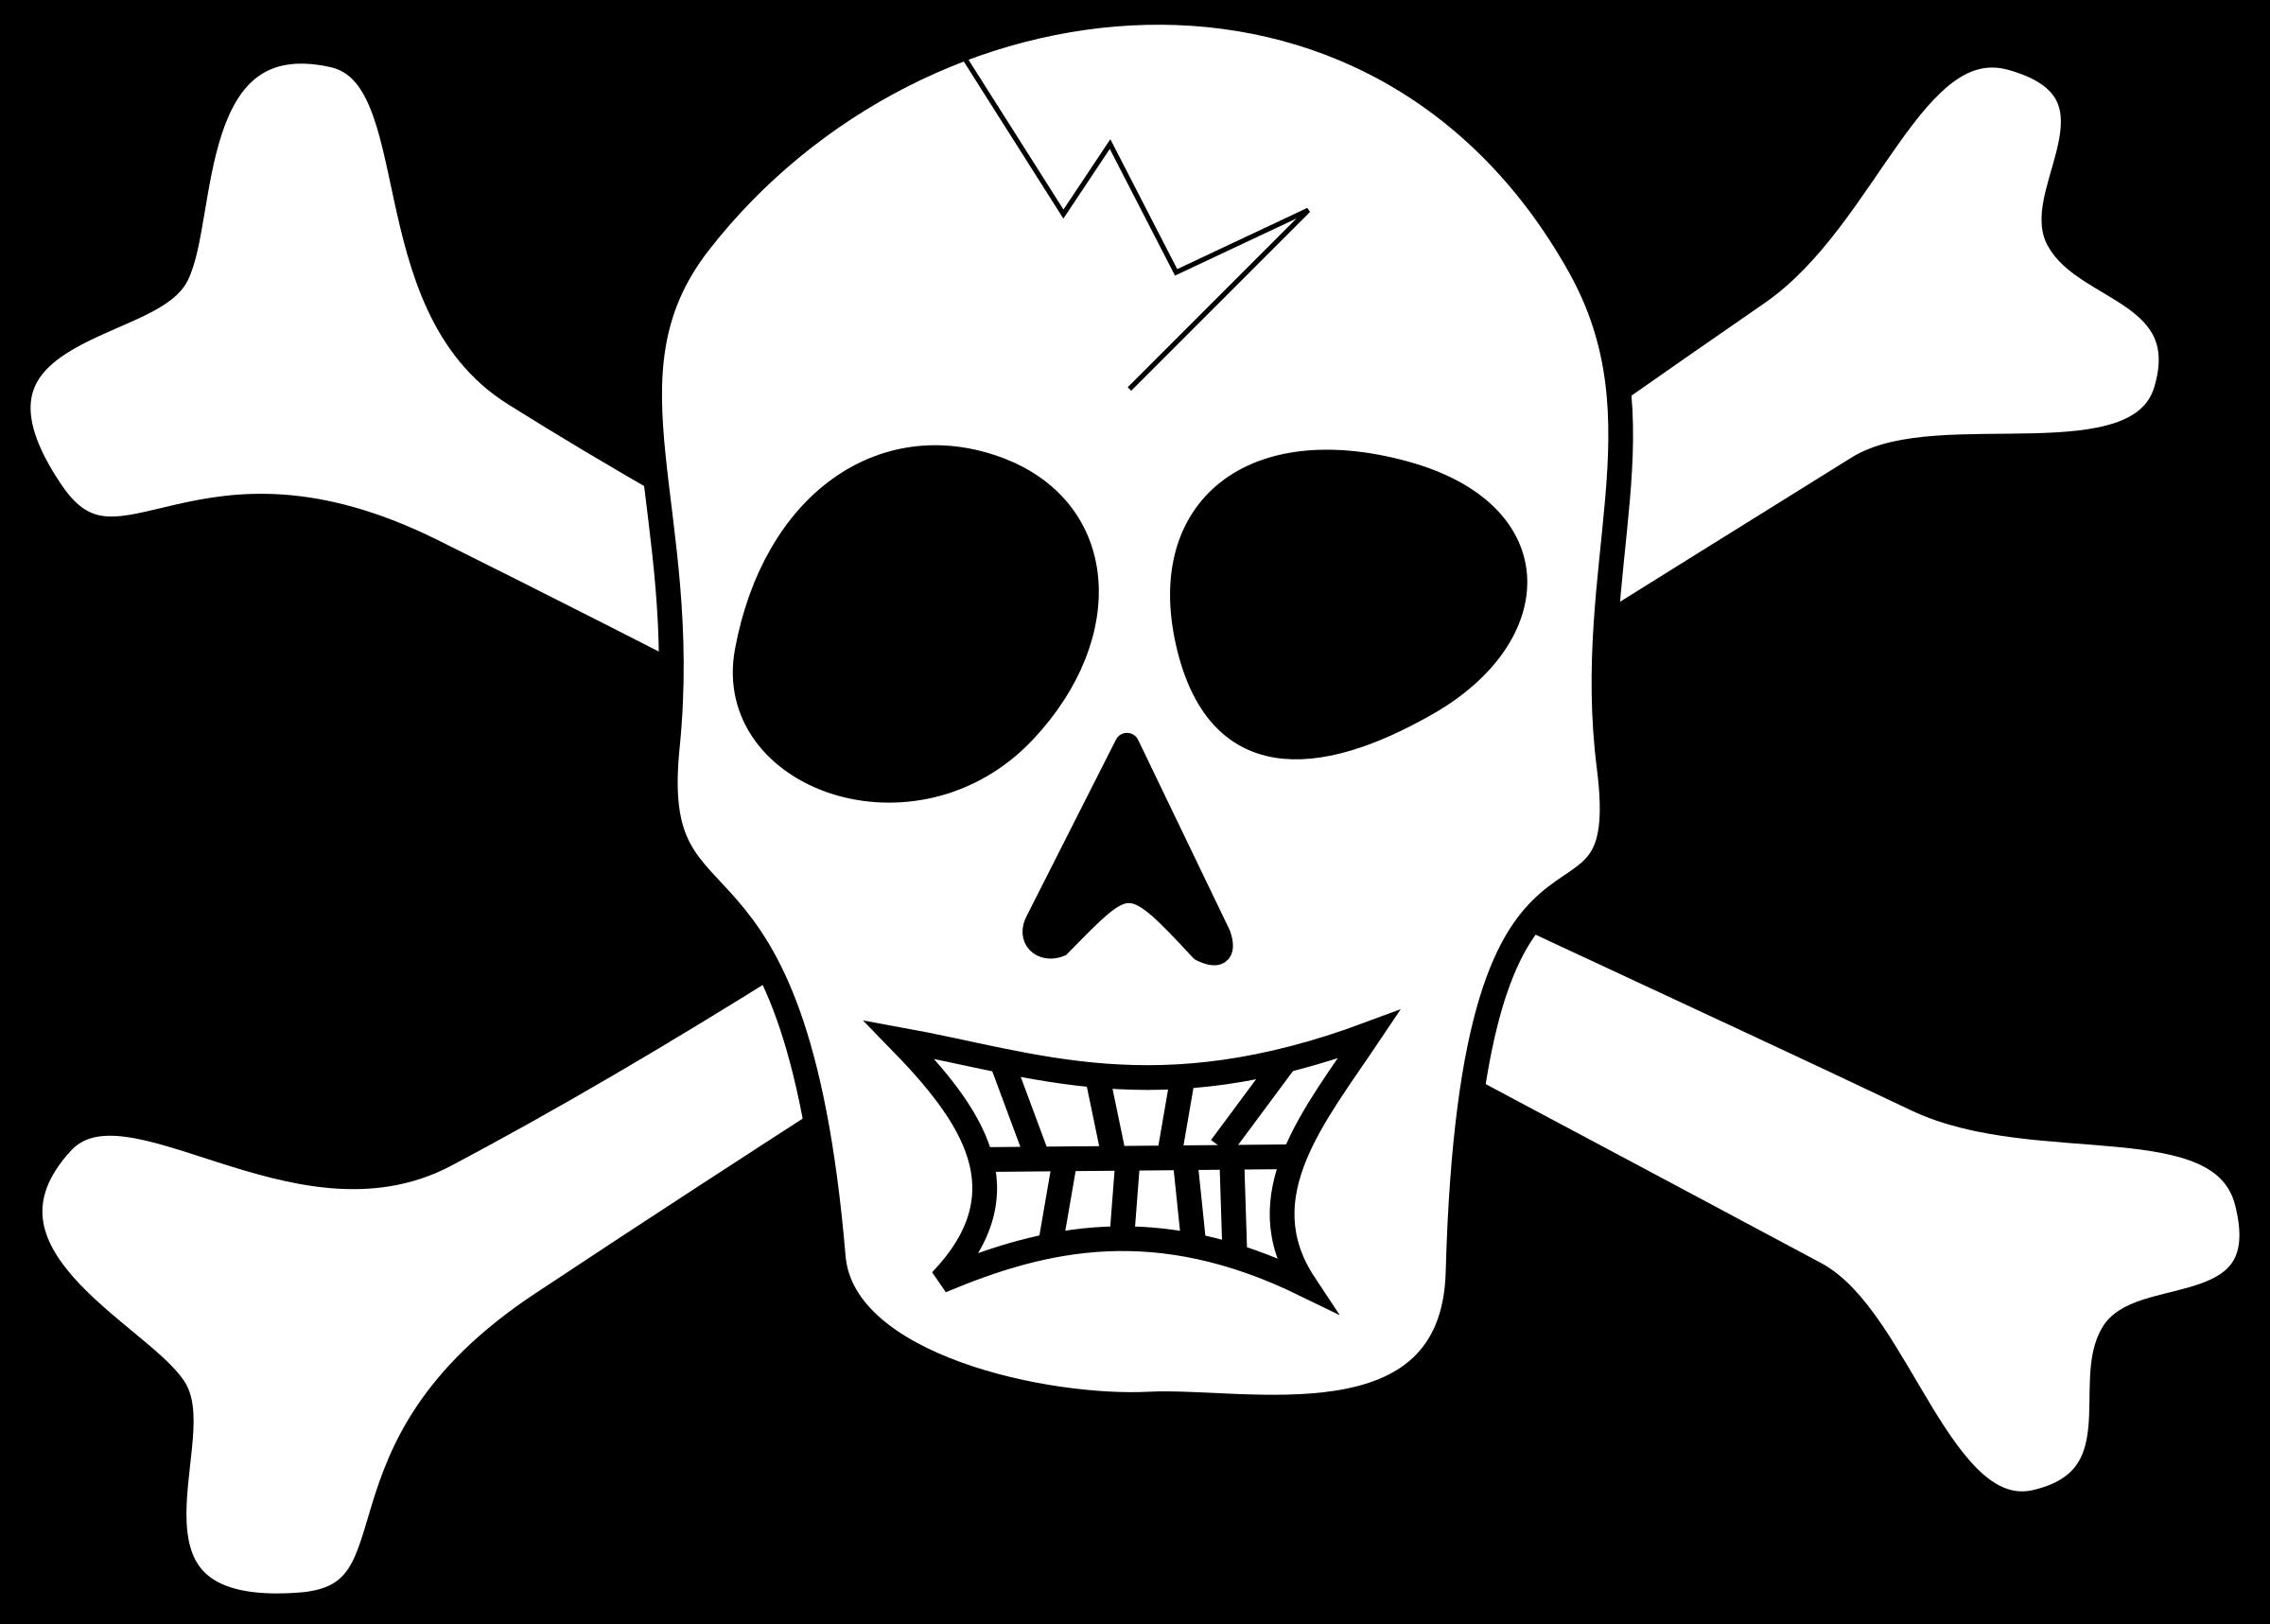 Pirate skull big image. Pirates clipart simple